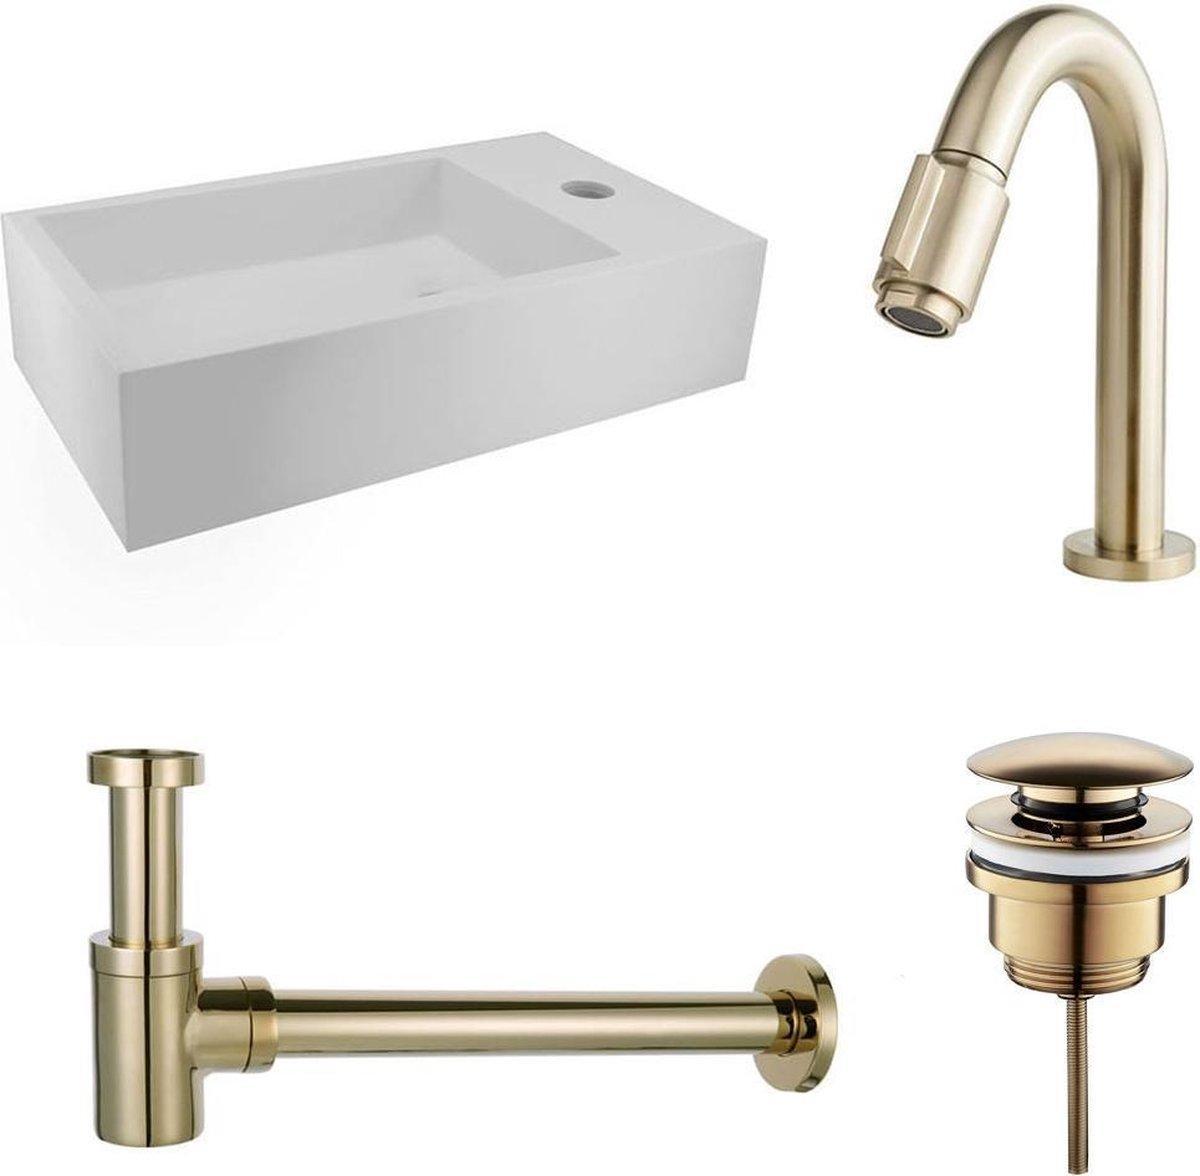 Fonteinset Nila Solid Surface Mat Wit Rechts 40x22x10cm Toiletkraan Knop Clickwaste Sifon Geborsteld Goud